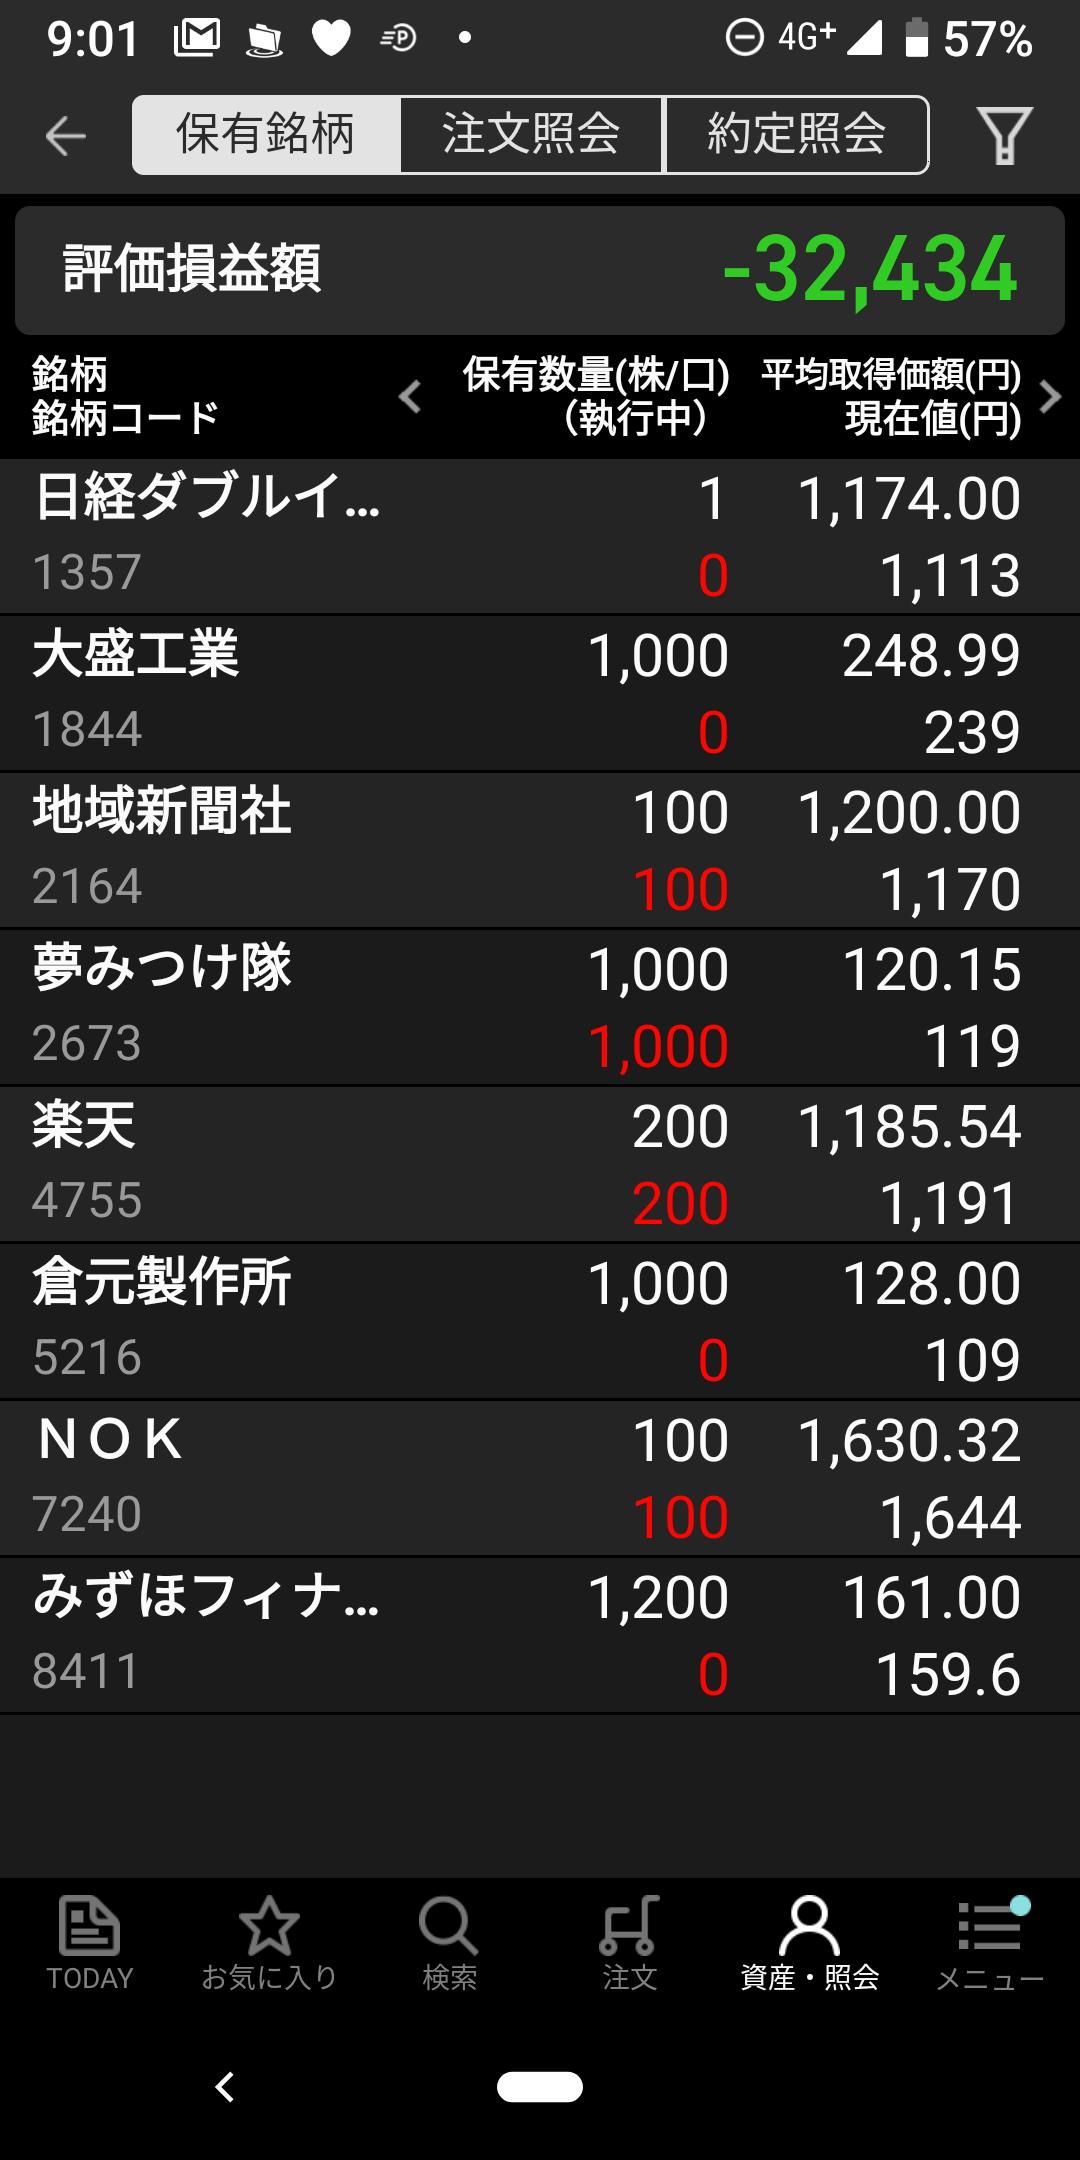 Screenshot (2019_07_08 9_01_15)